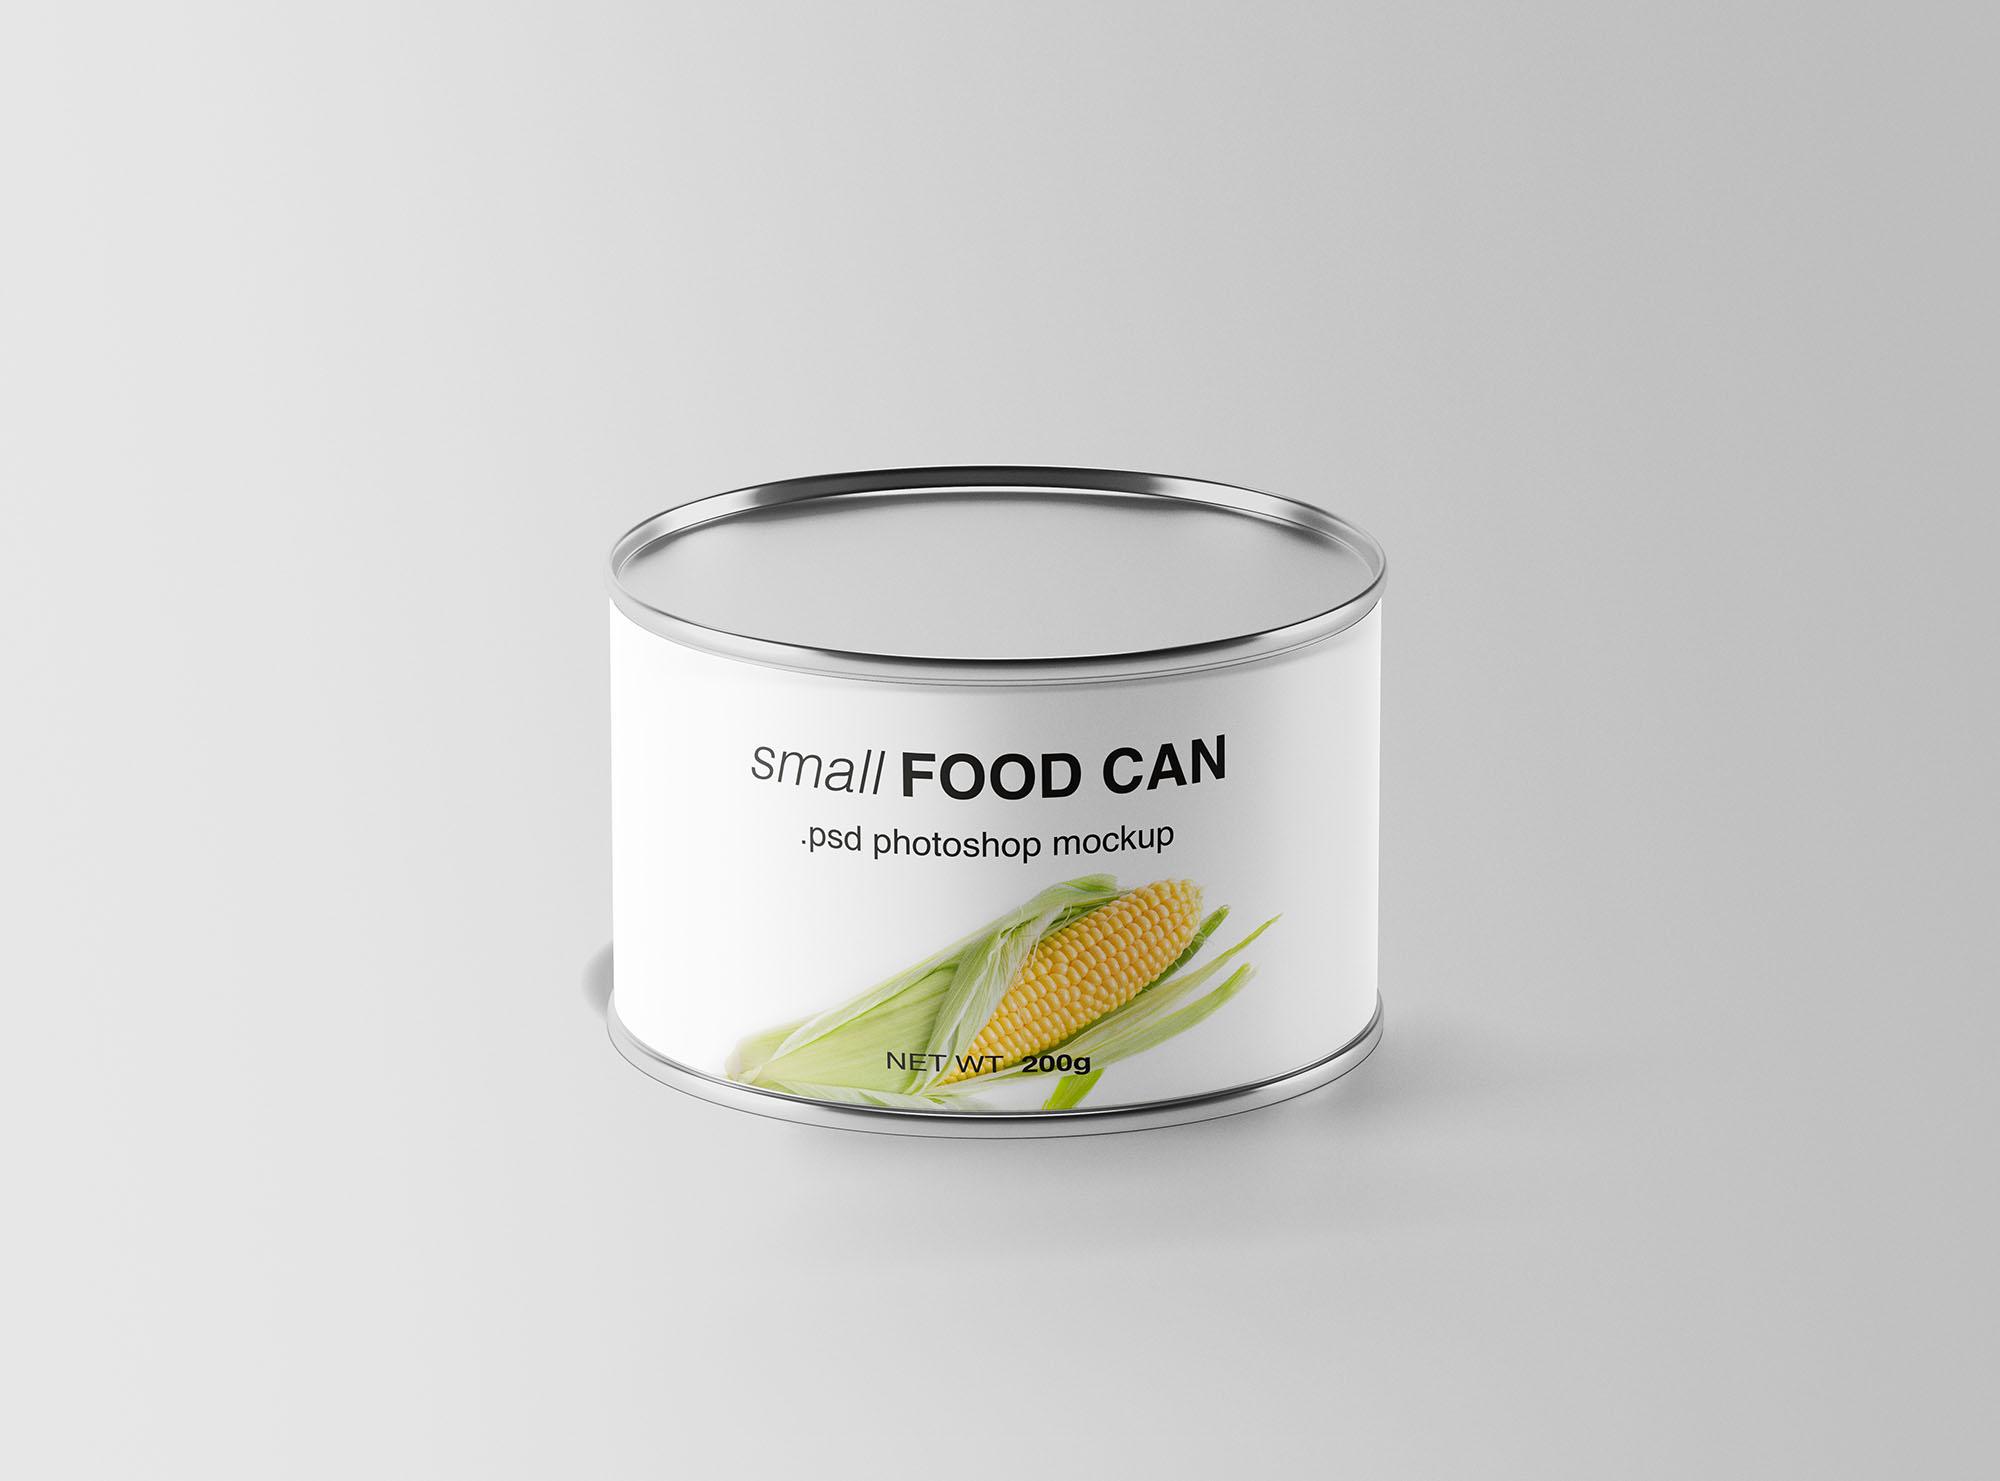 精致包装罐头样机素材模板展示素材下载Small Food Can Mockup